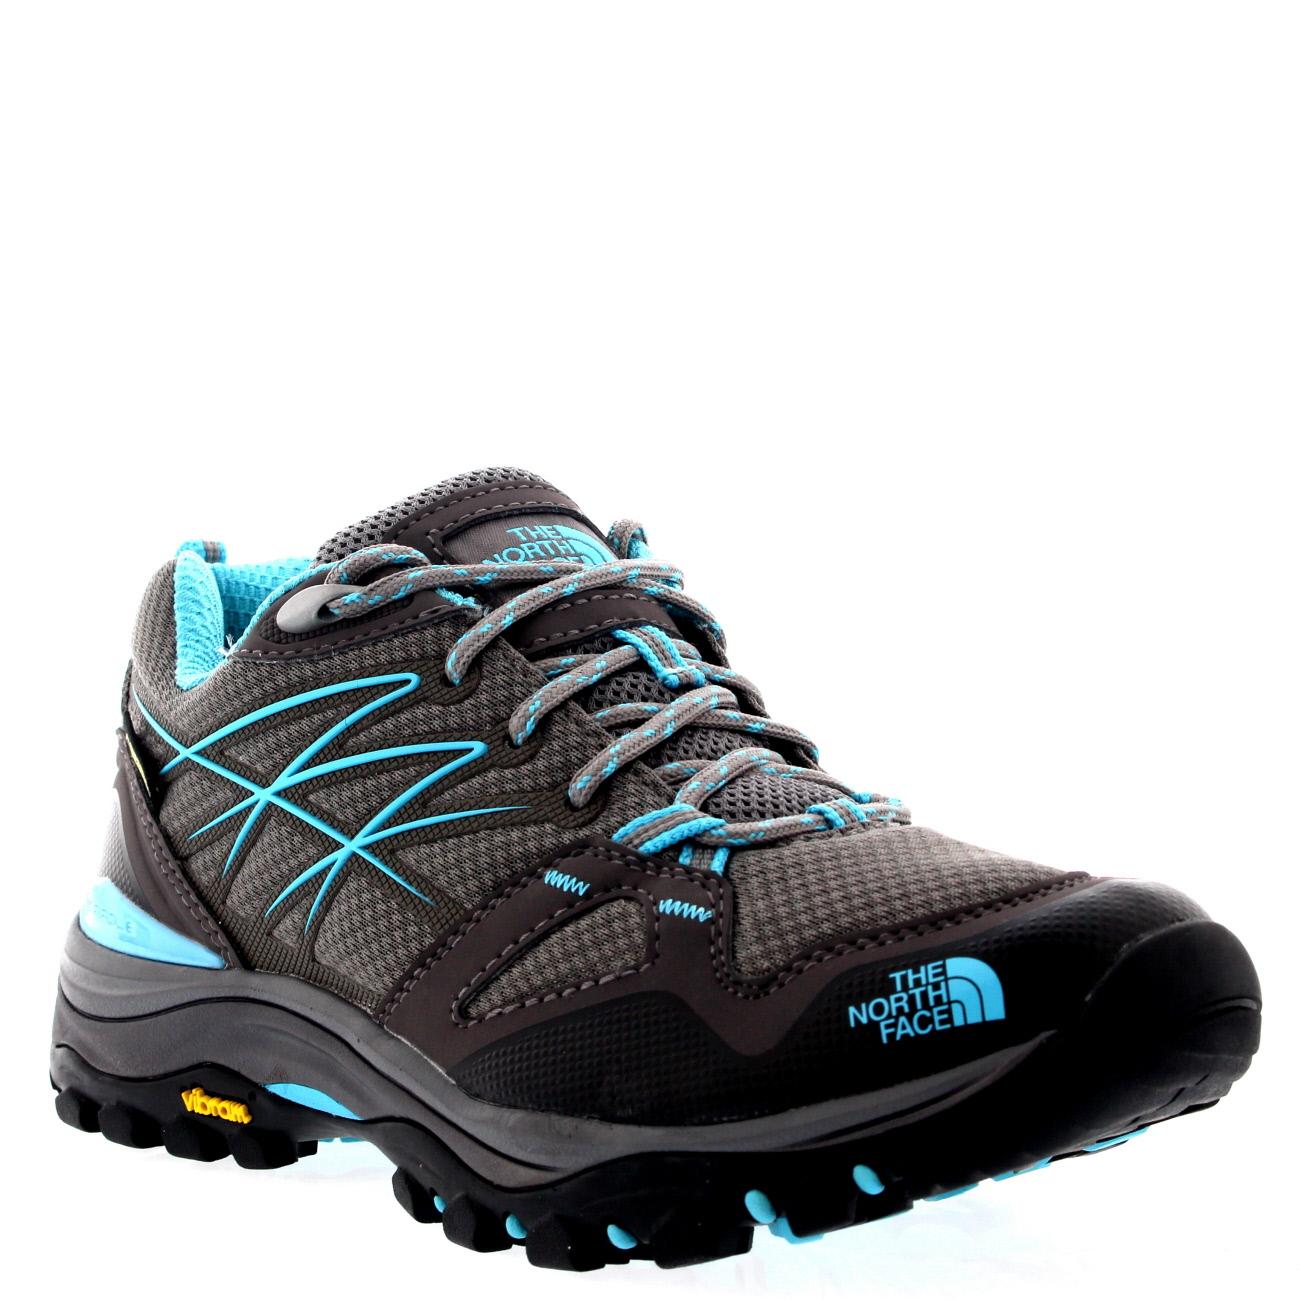 Womens The North Face Hedgehog Fastpack Gore-Tex Hiking Trainers EU ... b543c1760bcb